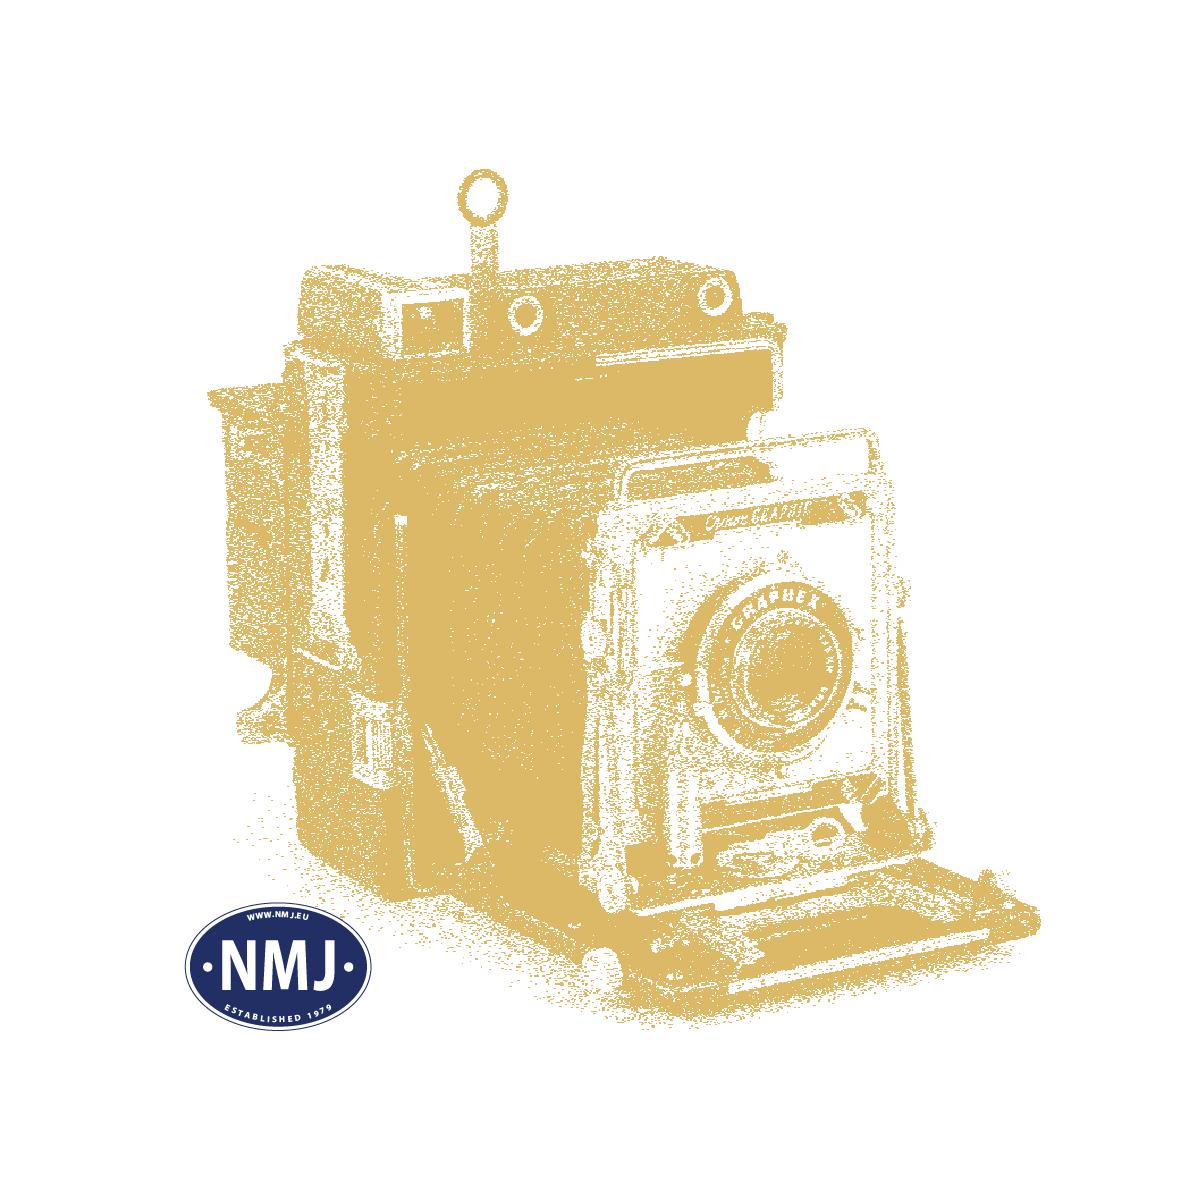 FAL180450 - Gateskilt, parkometer, brannhydranter